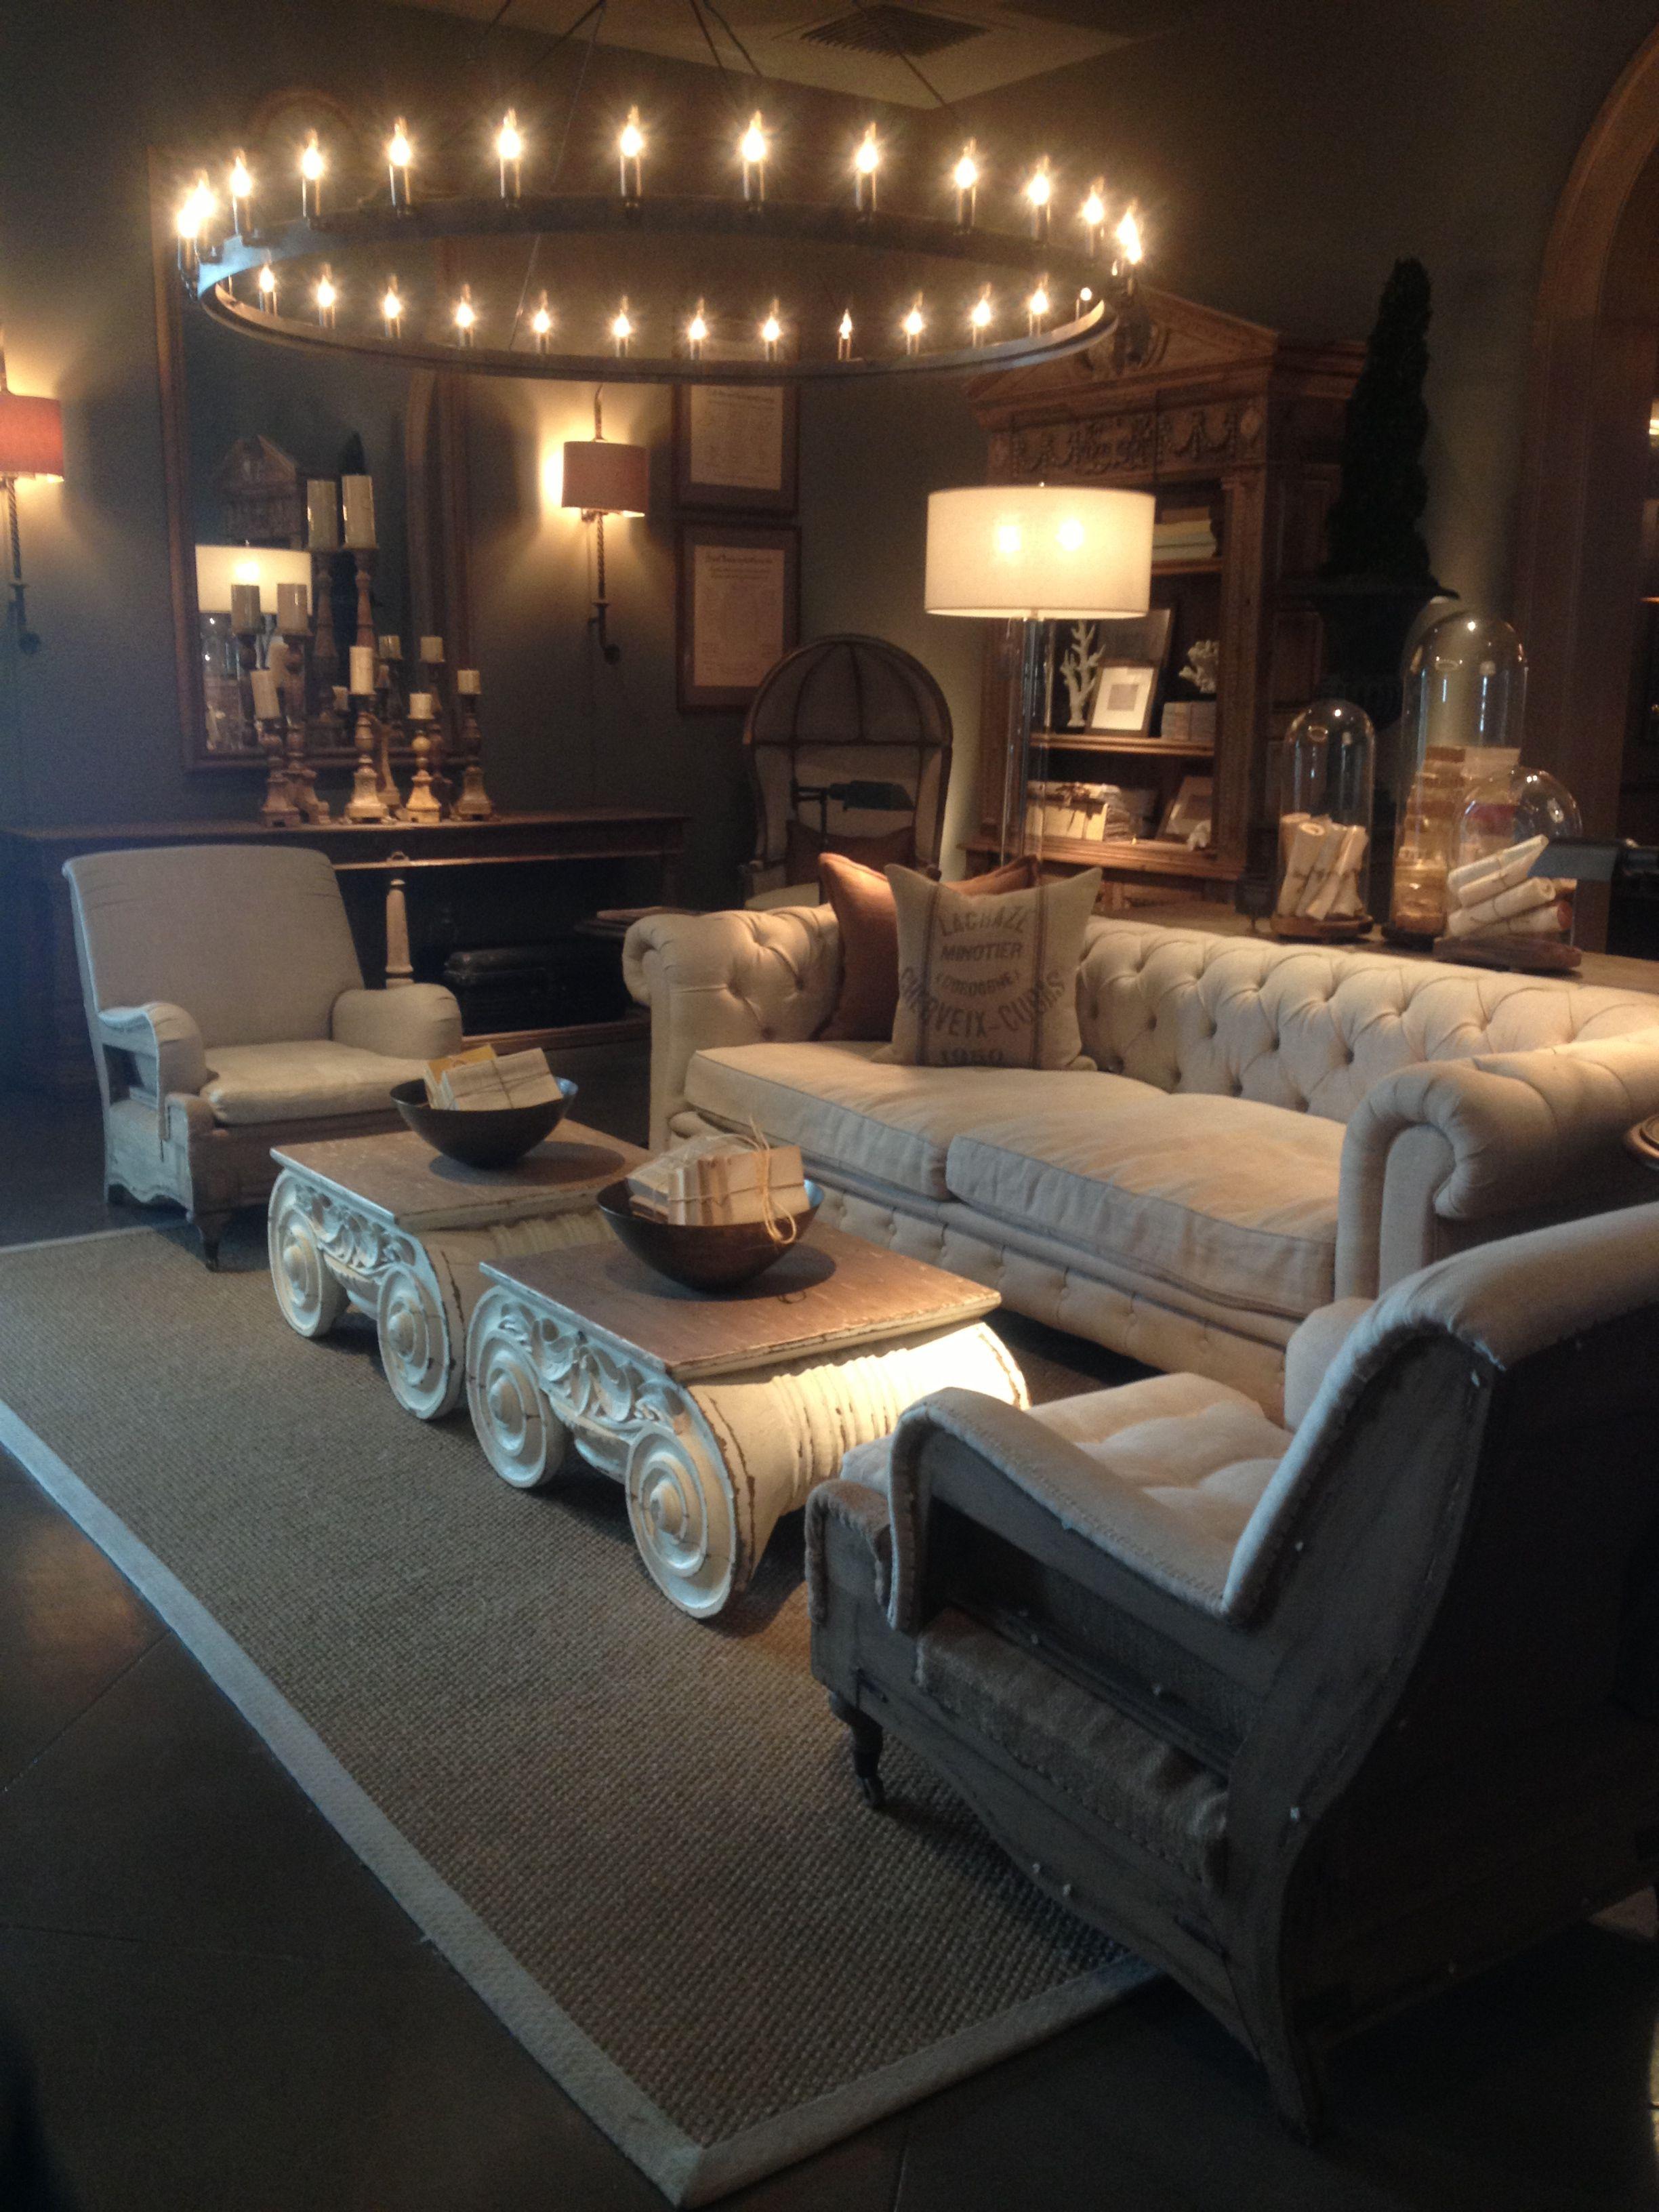 Pin By Gina Garcia On The Chandelier Restoration Hardware Living Room Living Room Furniture Living Room Lighting